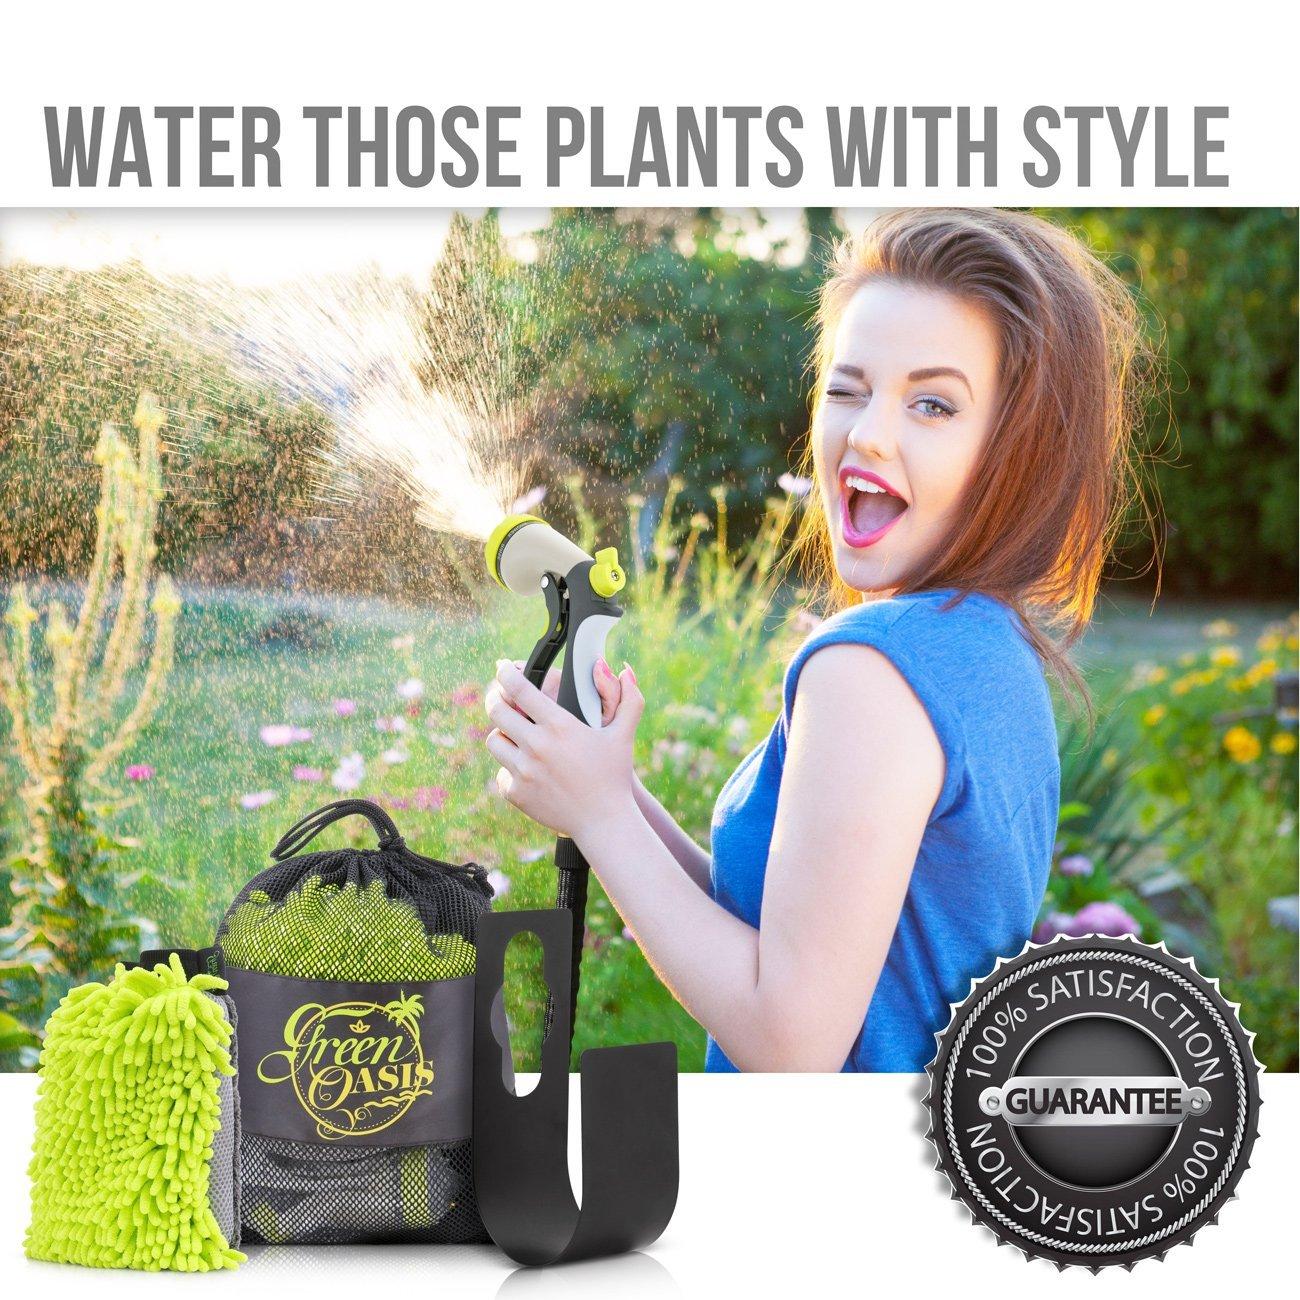 50ft Expandable Garden Hose Made of Triple Natural Latex Set + Free Bonuses